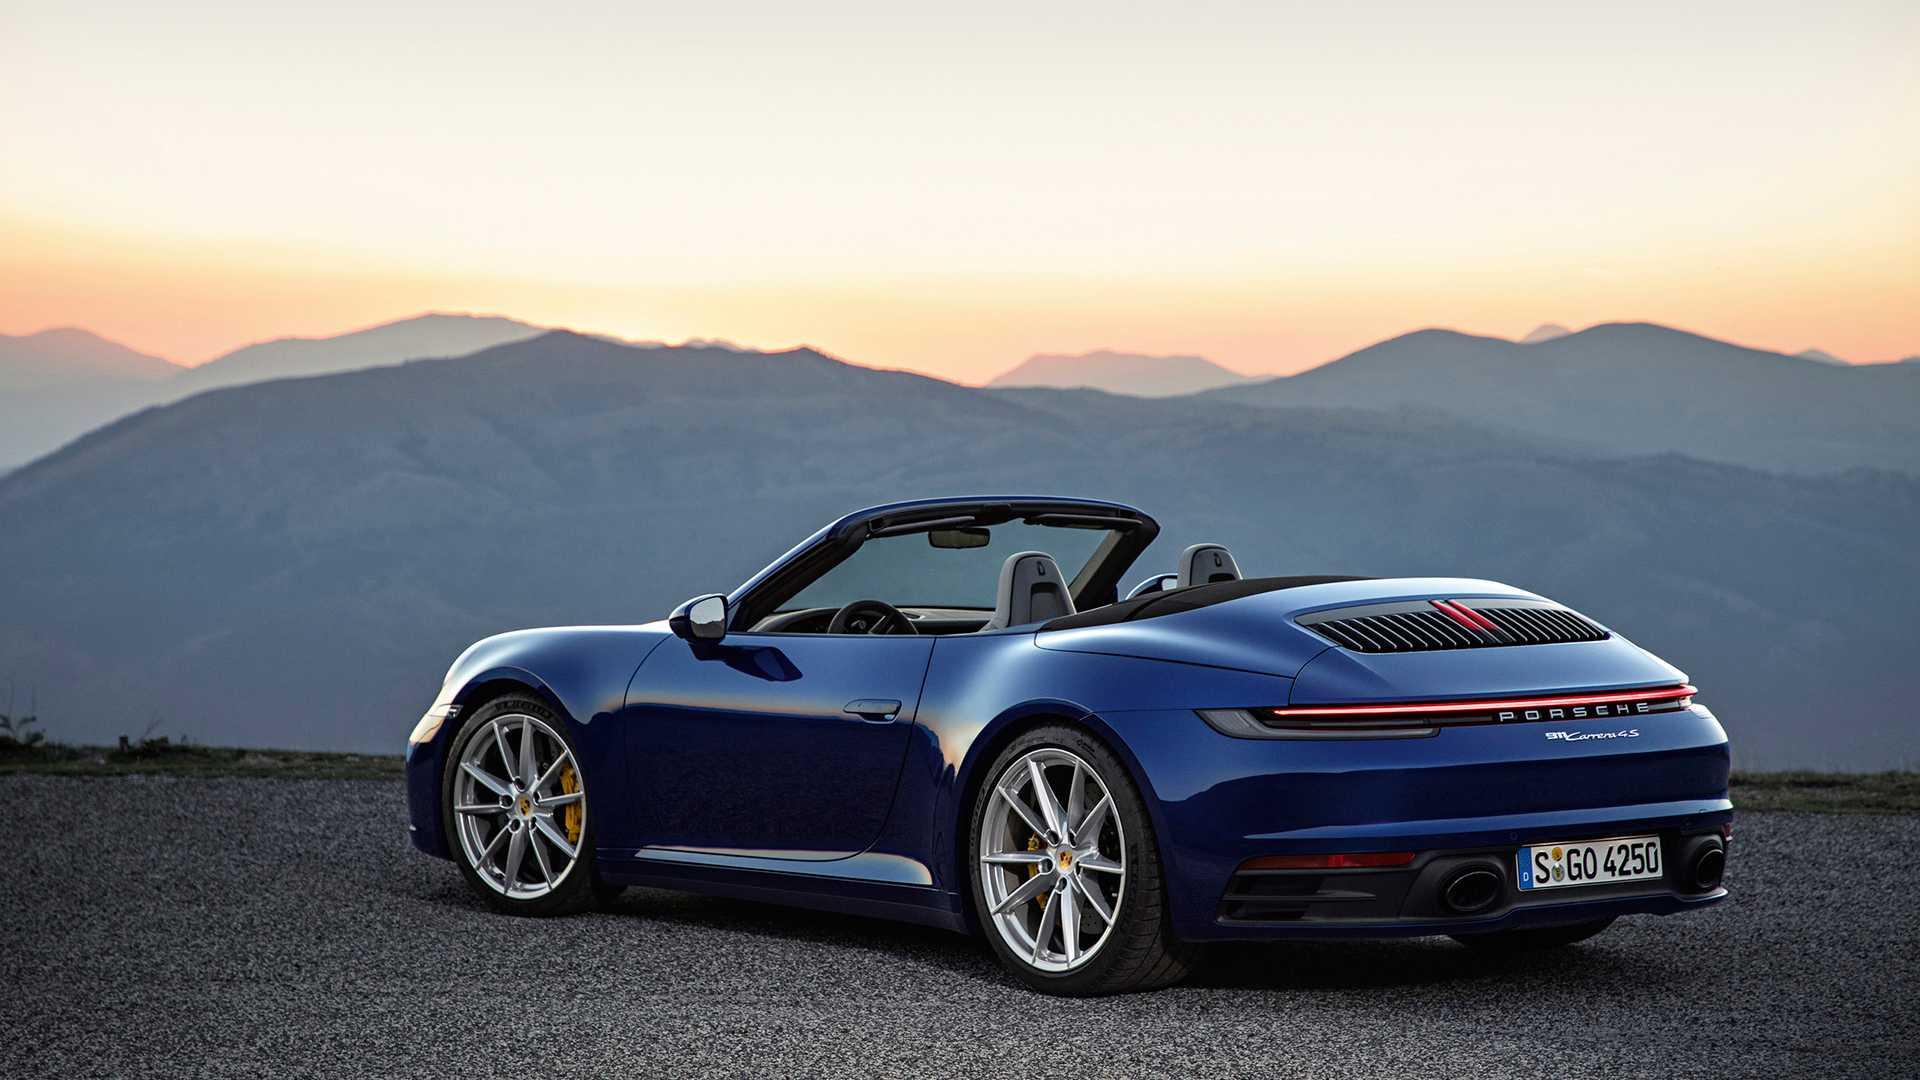 2020-porsche-911-cabriolet-trinh-lang-4.jpg